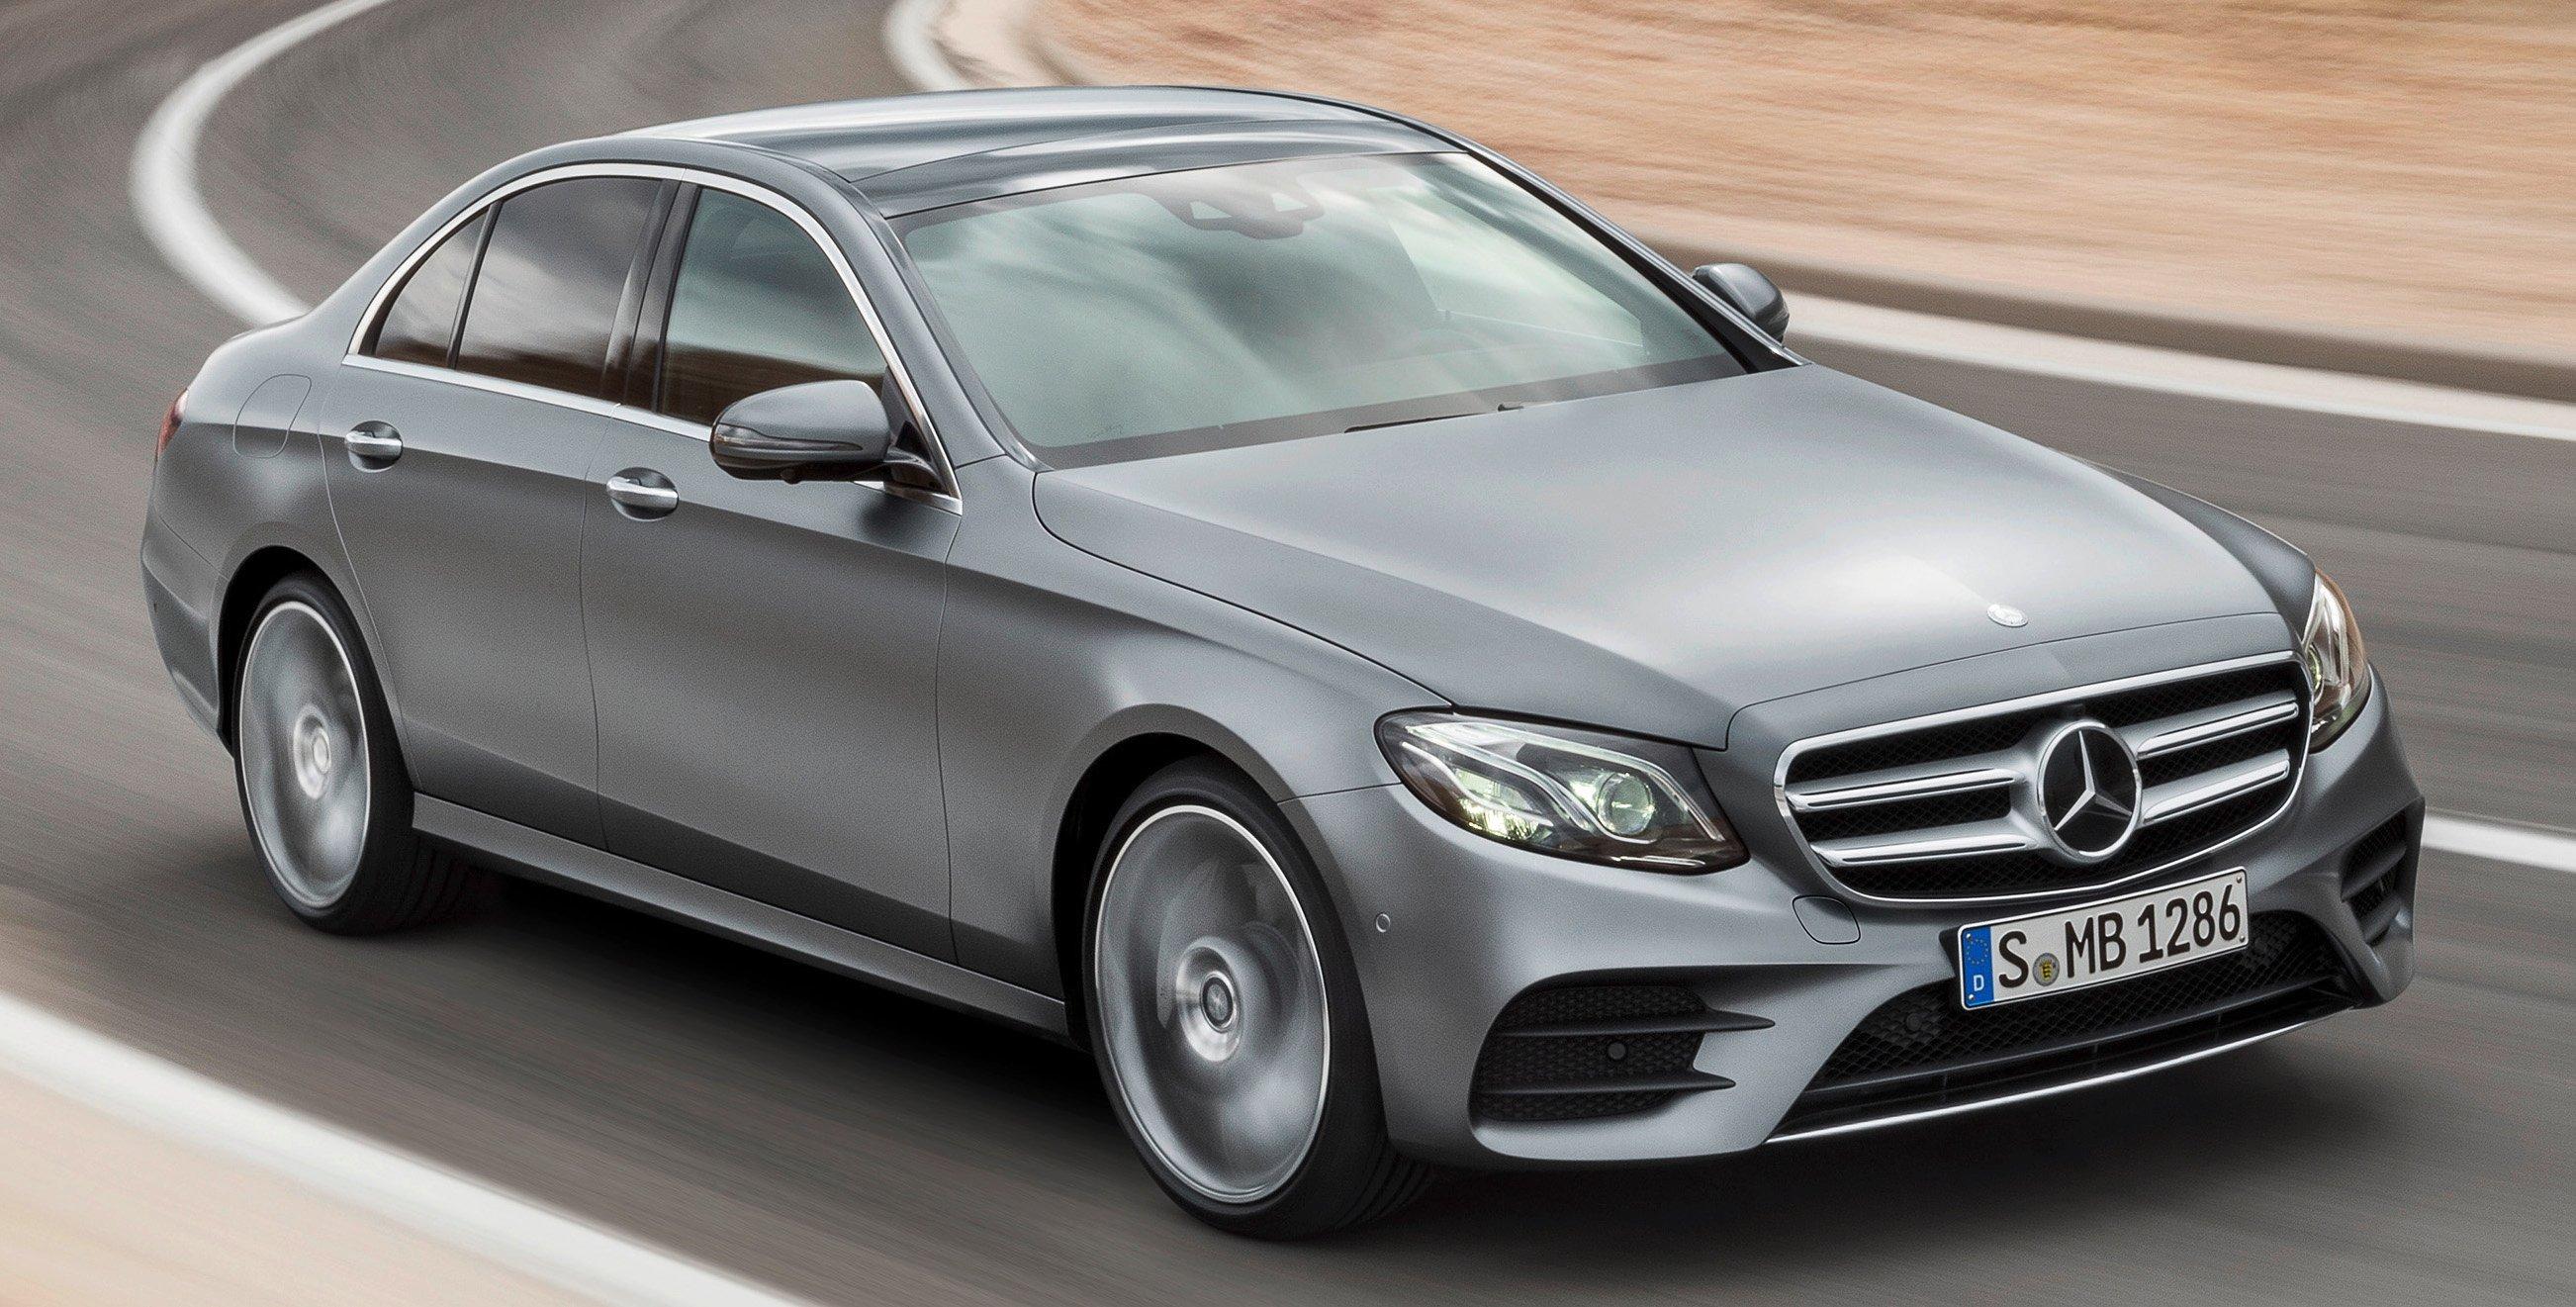 Mercedes Benz A Class >> W213 Mercedes-Benz E-Class – full details, pics, video Paul Tan - Image 426632